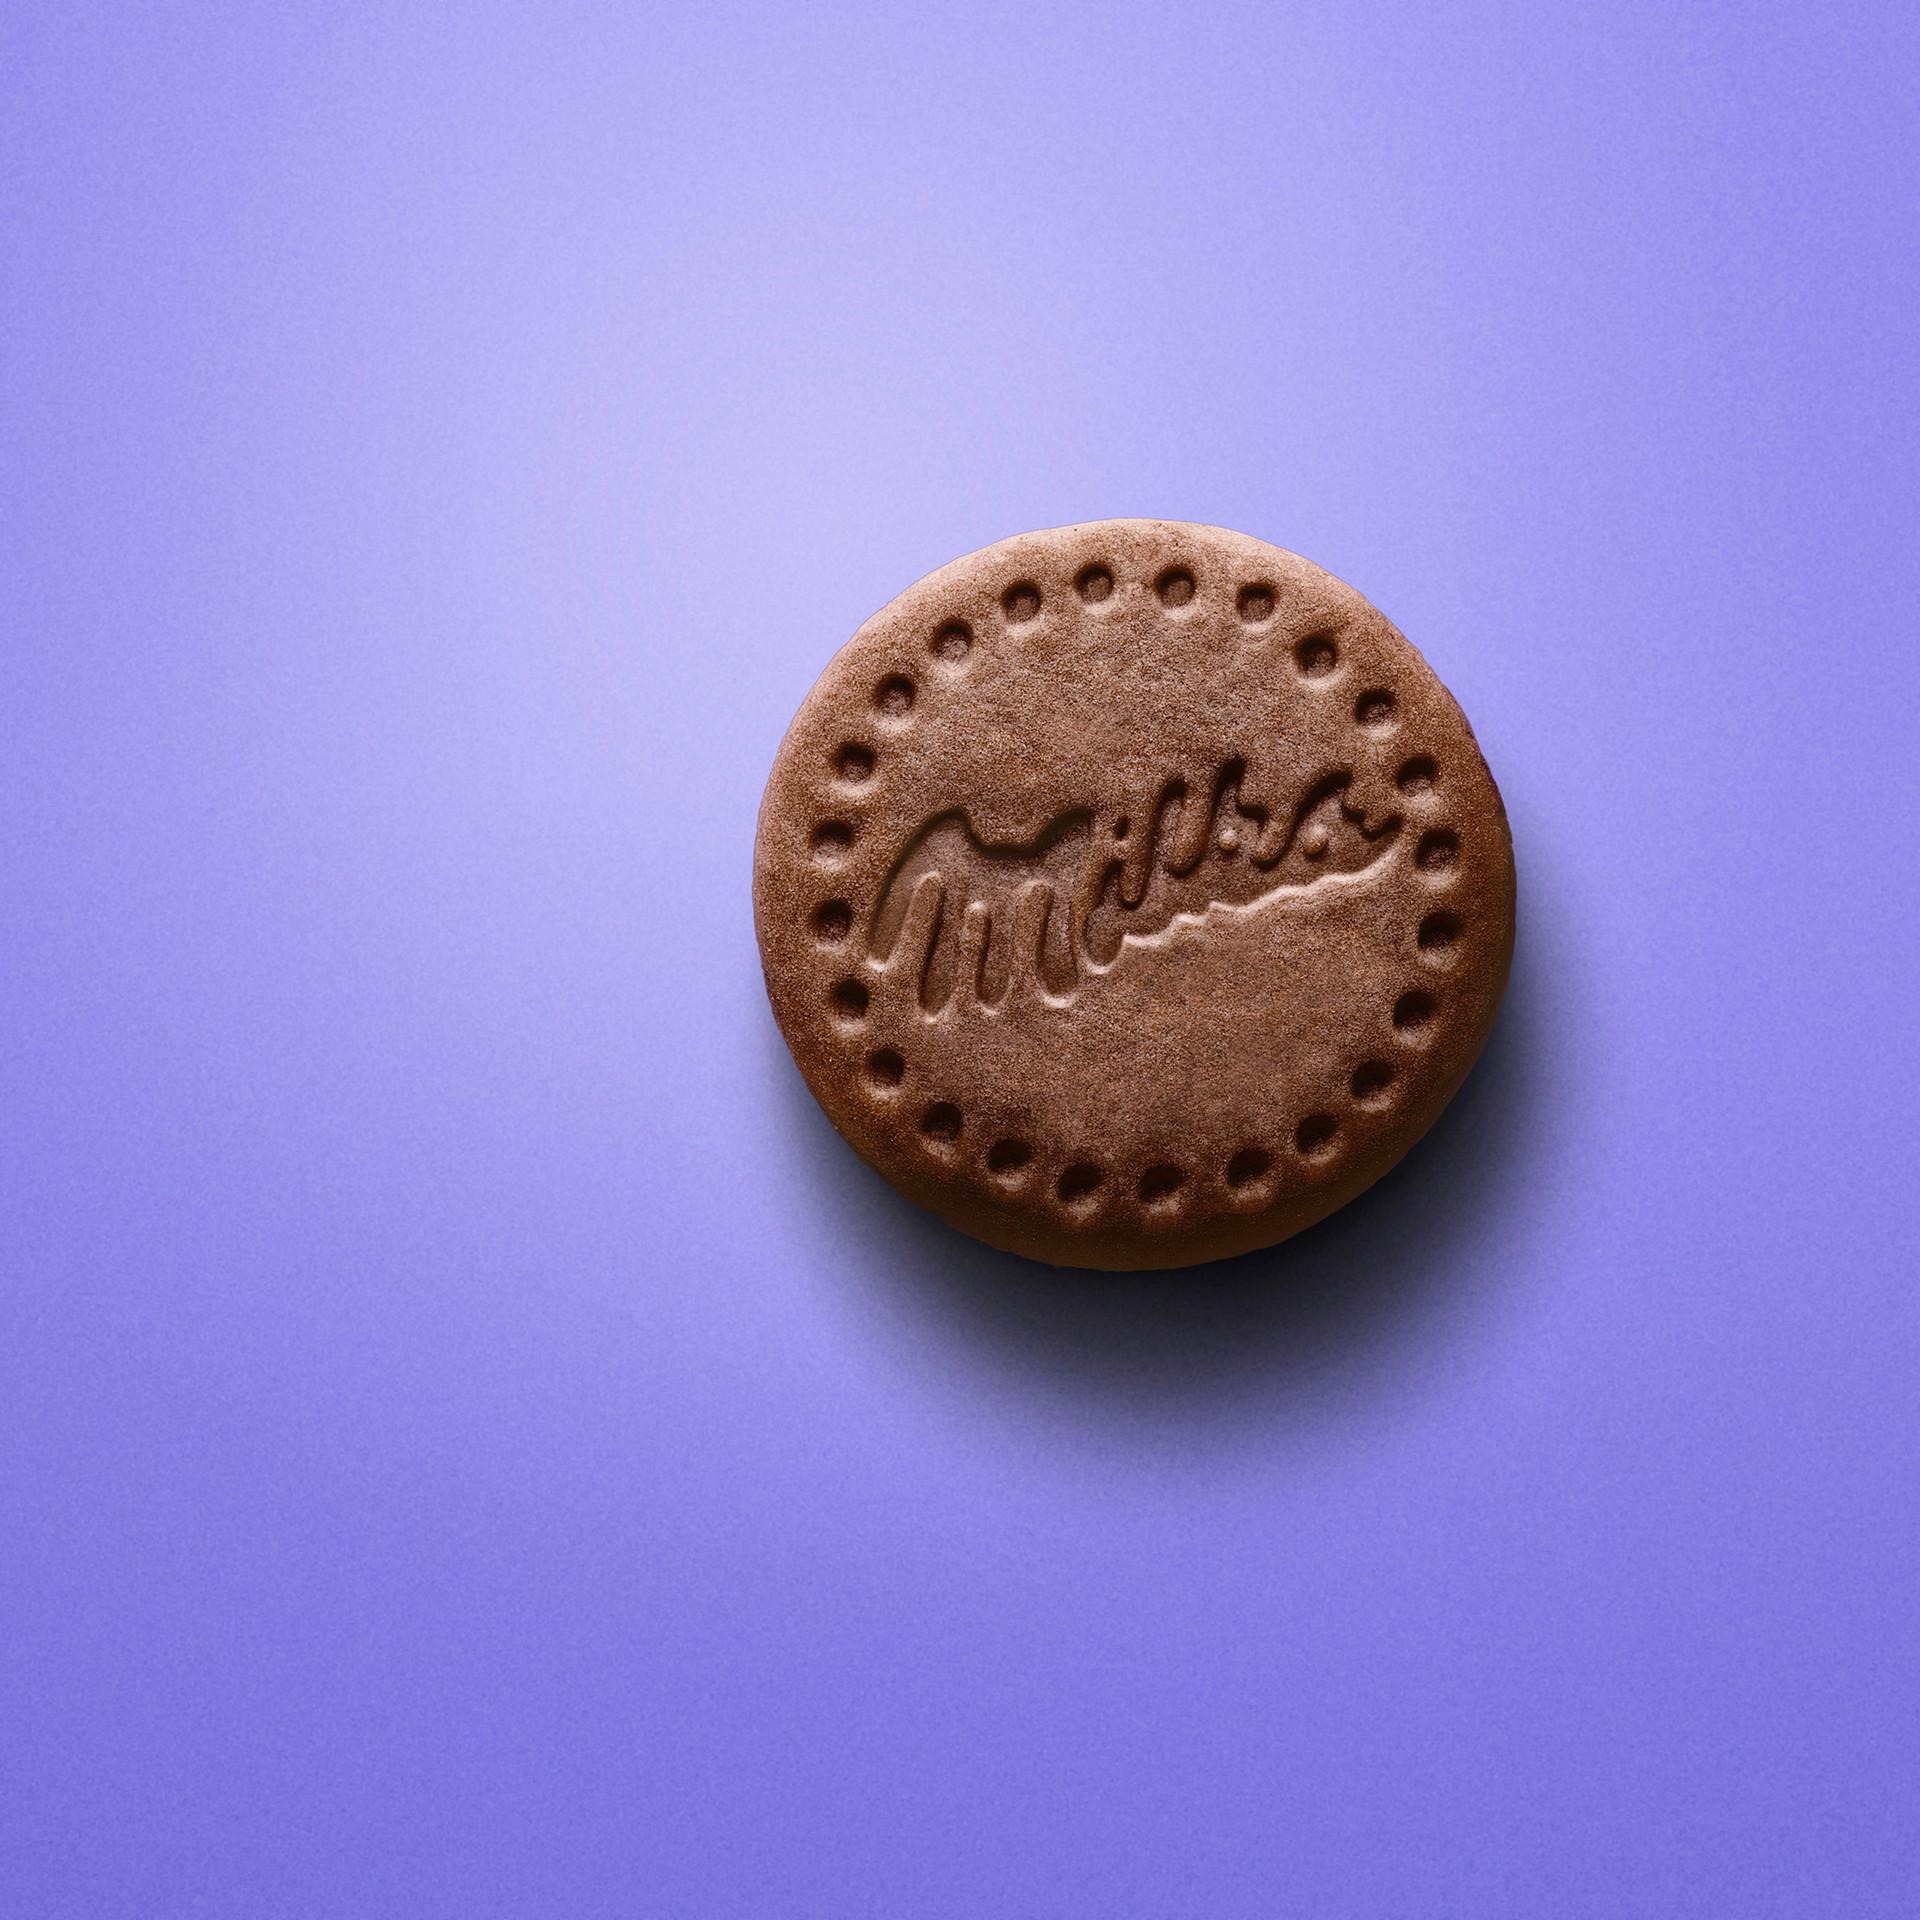 Milka Cookie Mousse Chocolate CENITAL.jp